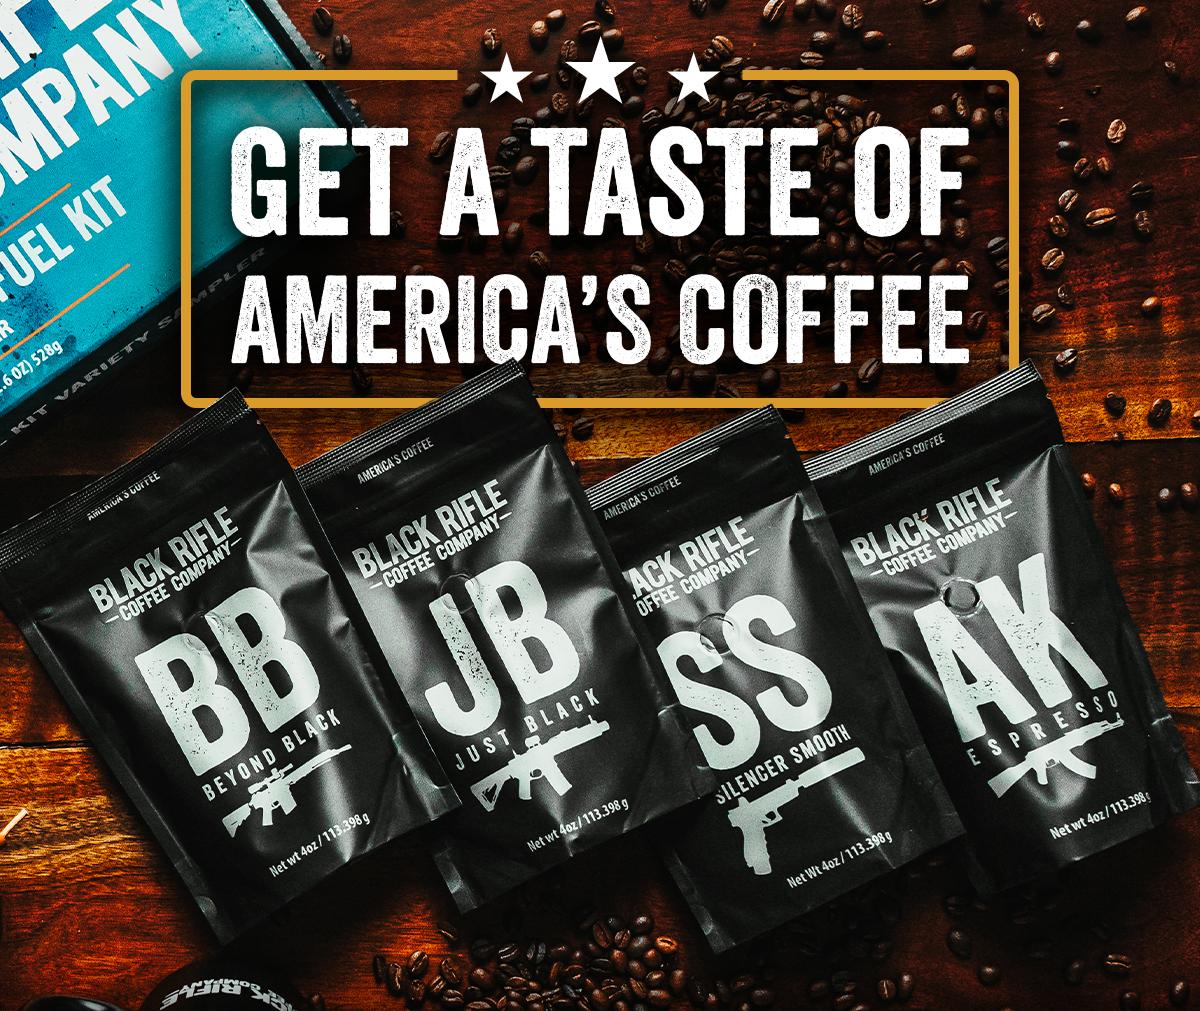 Get a Taste of America's Coffee